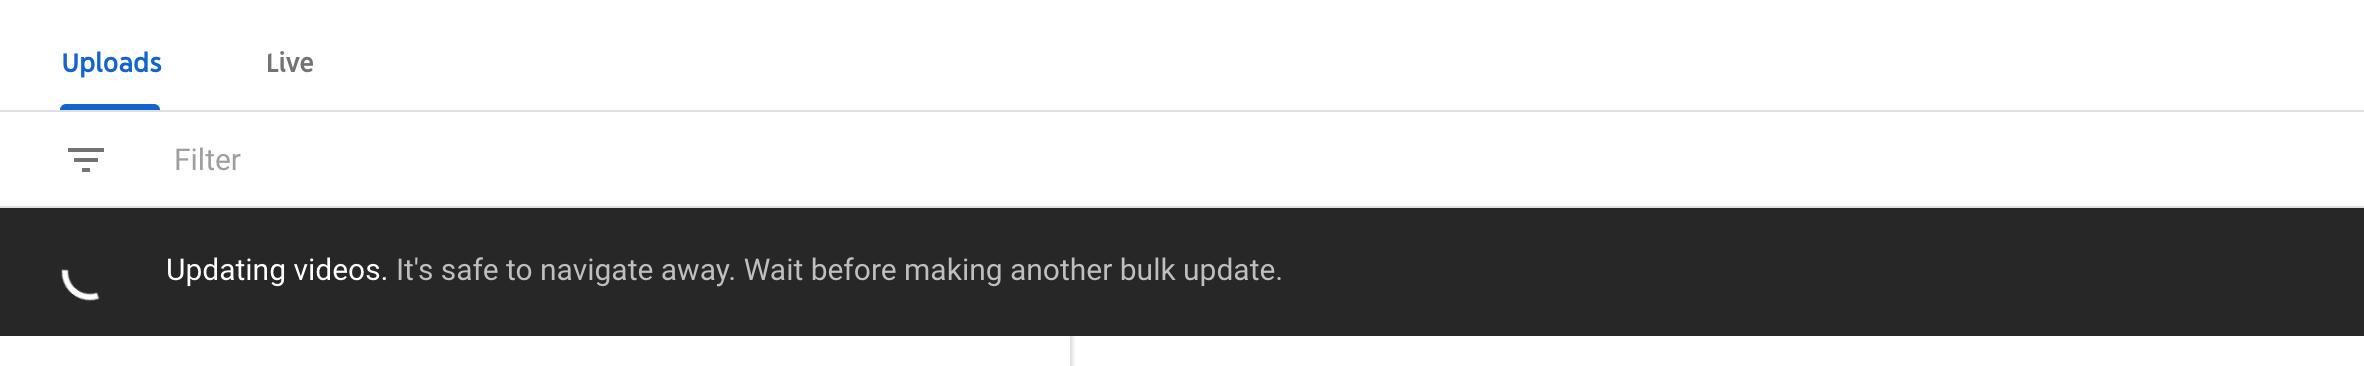 Bulk updating description